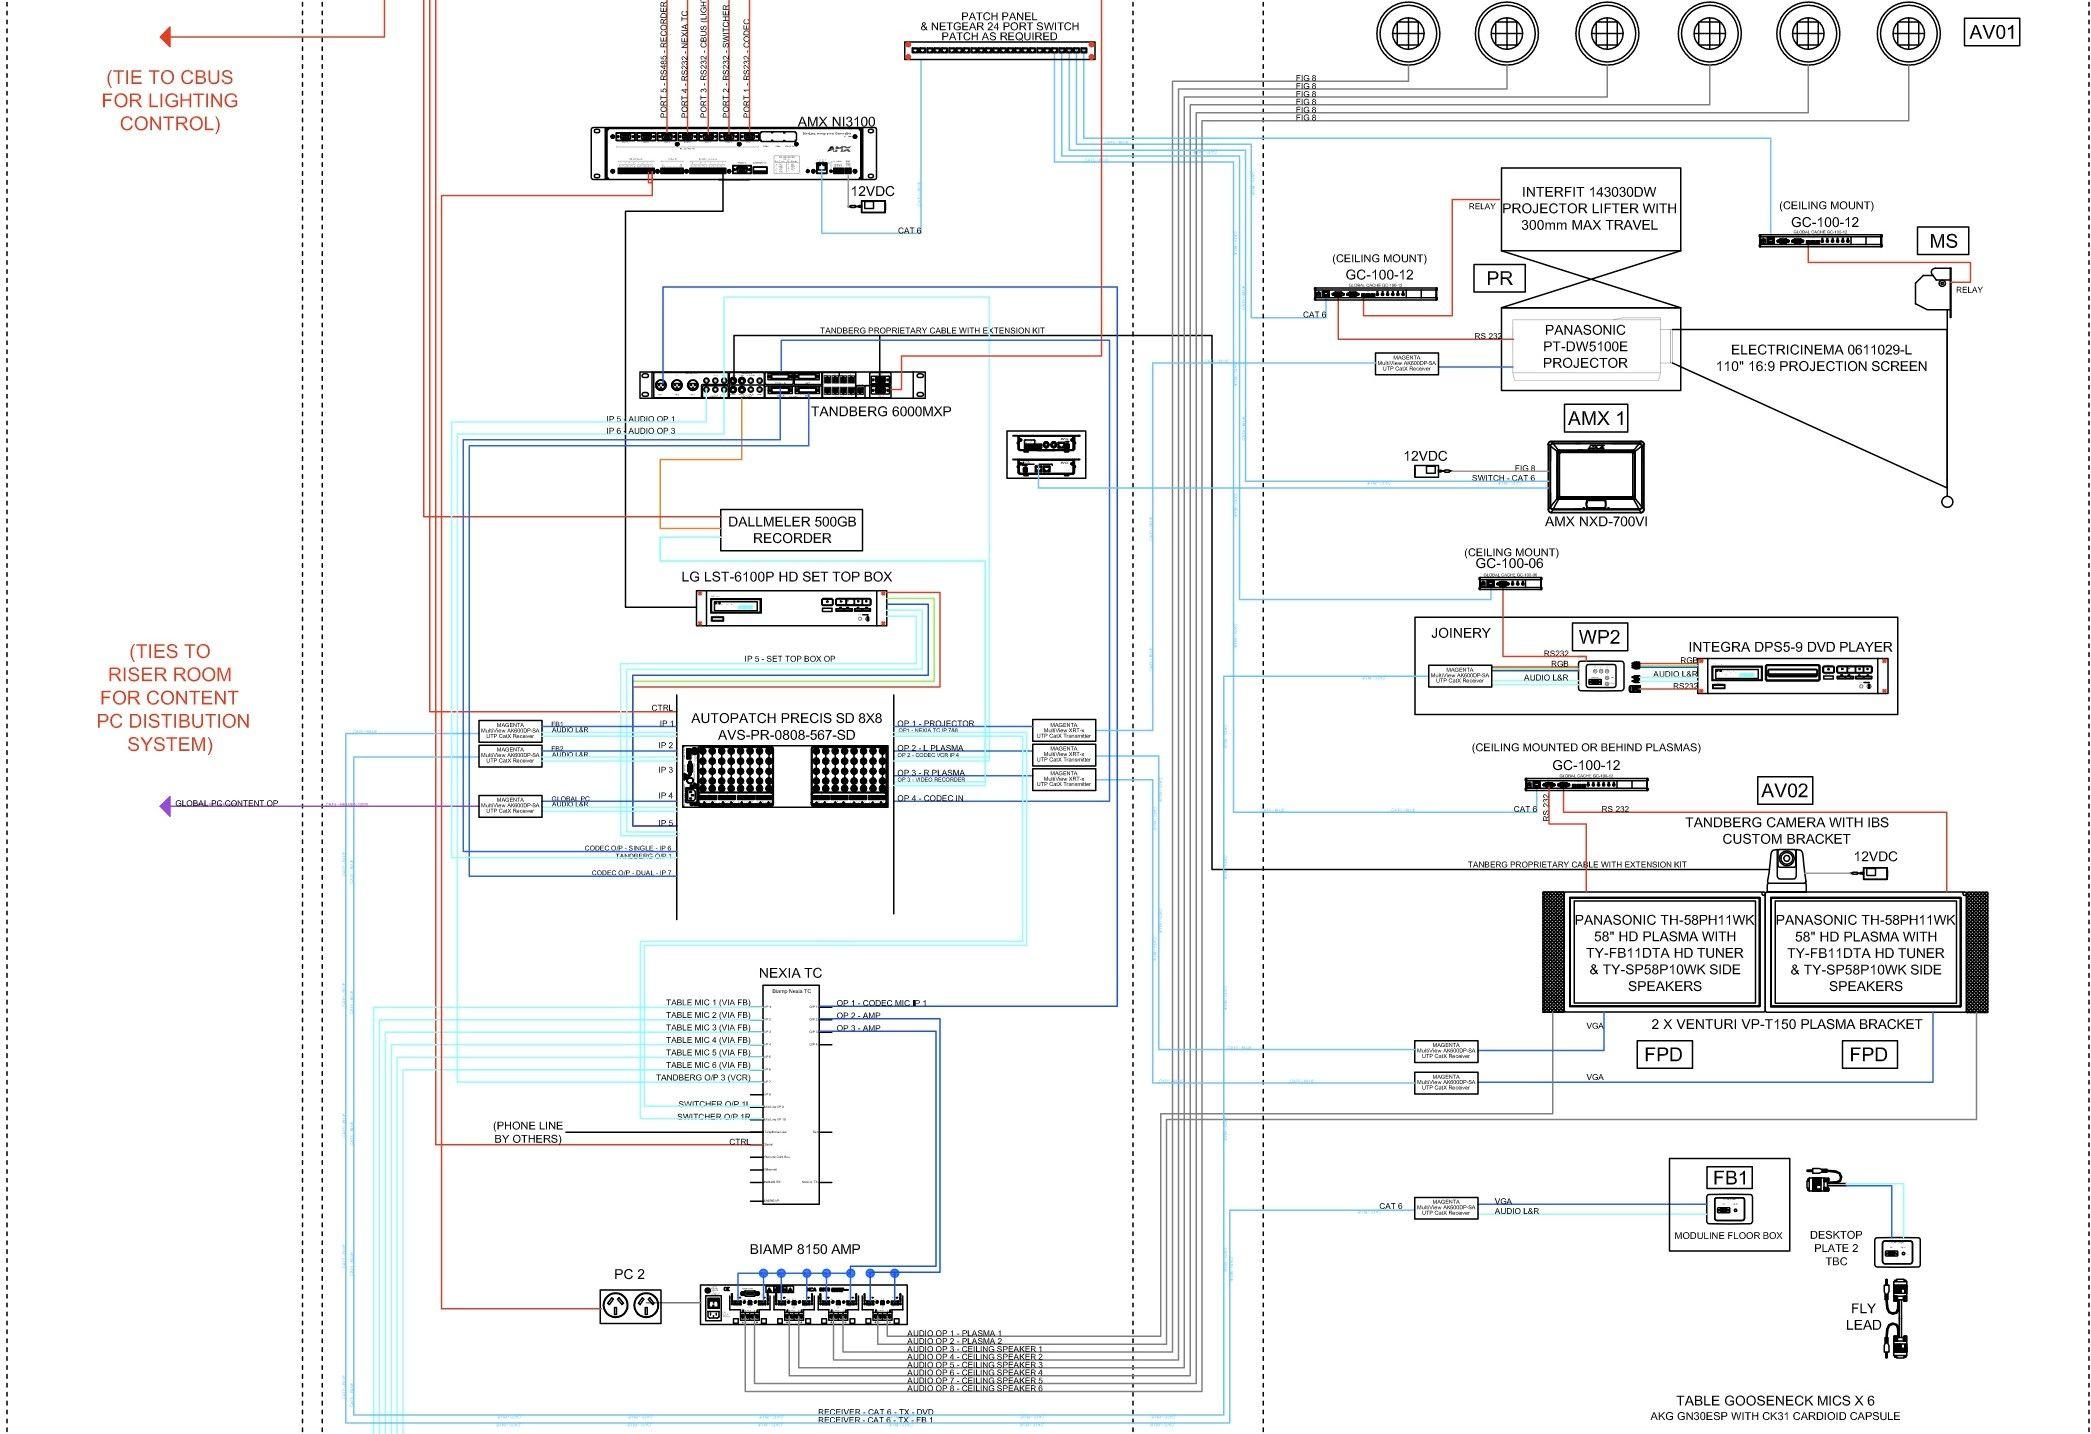 Av wiring schematic videoconferencing system portfolio audio av wiring schematic videoconferencing system cheapraybanclubmaster Gallery